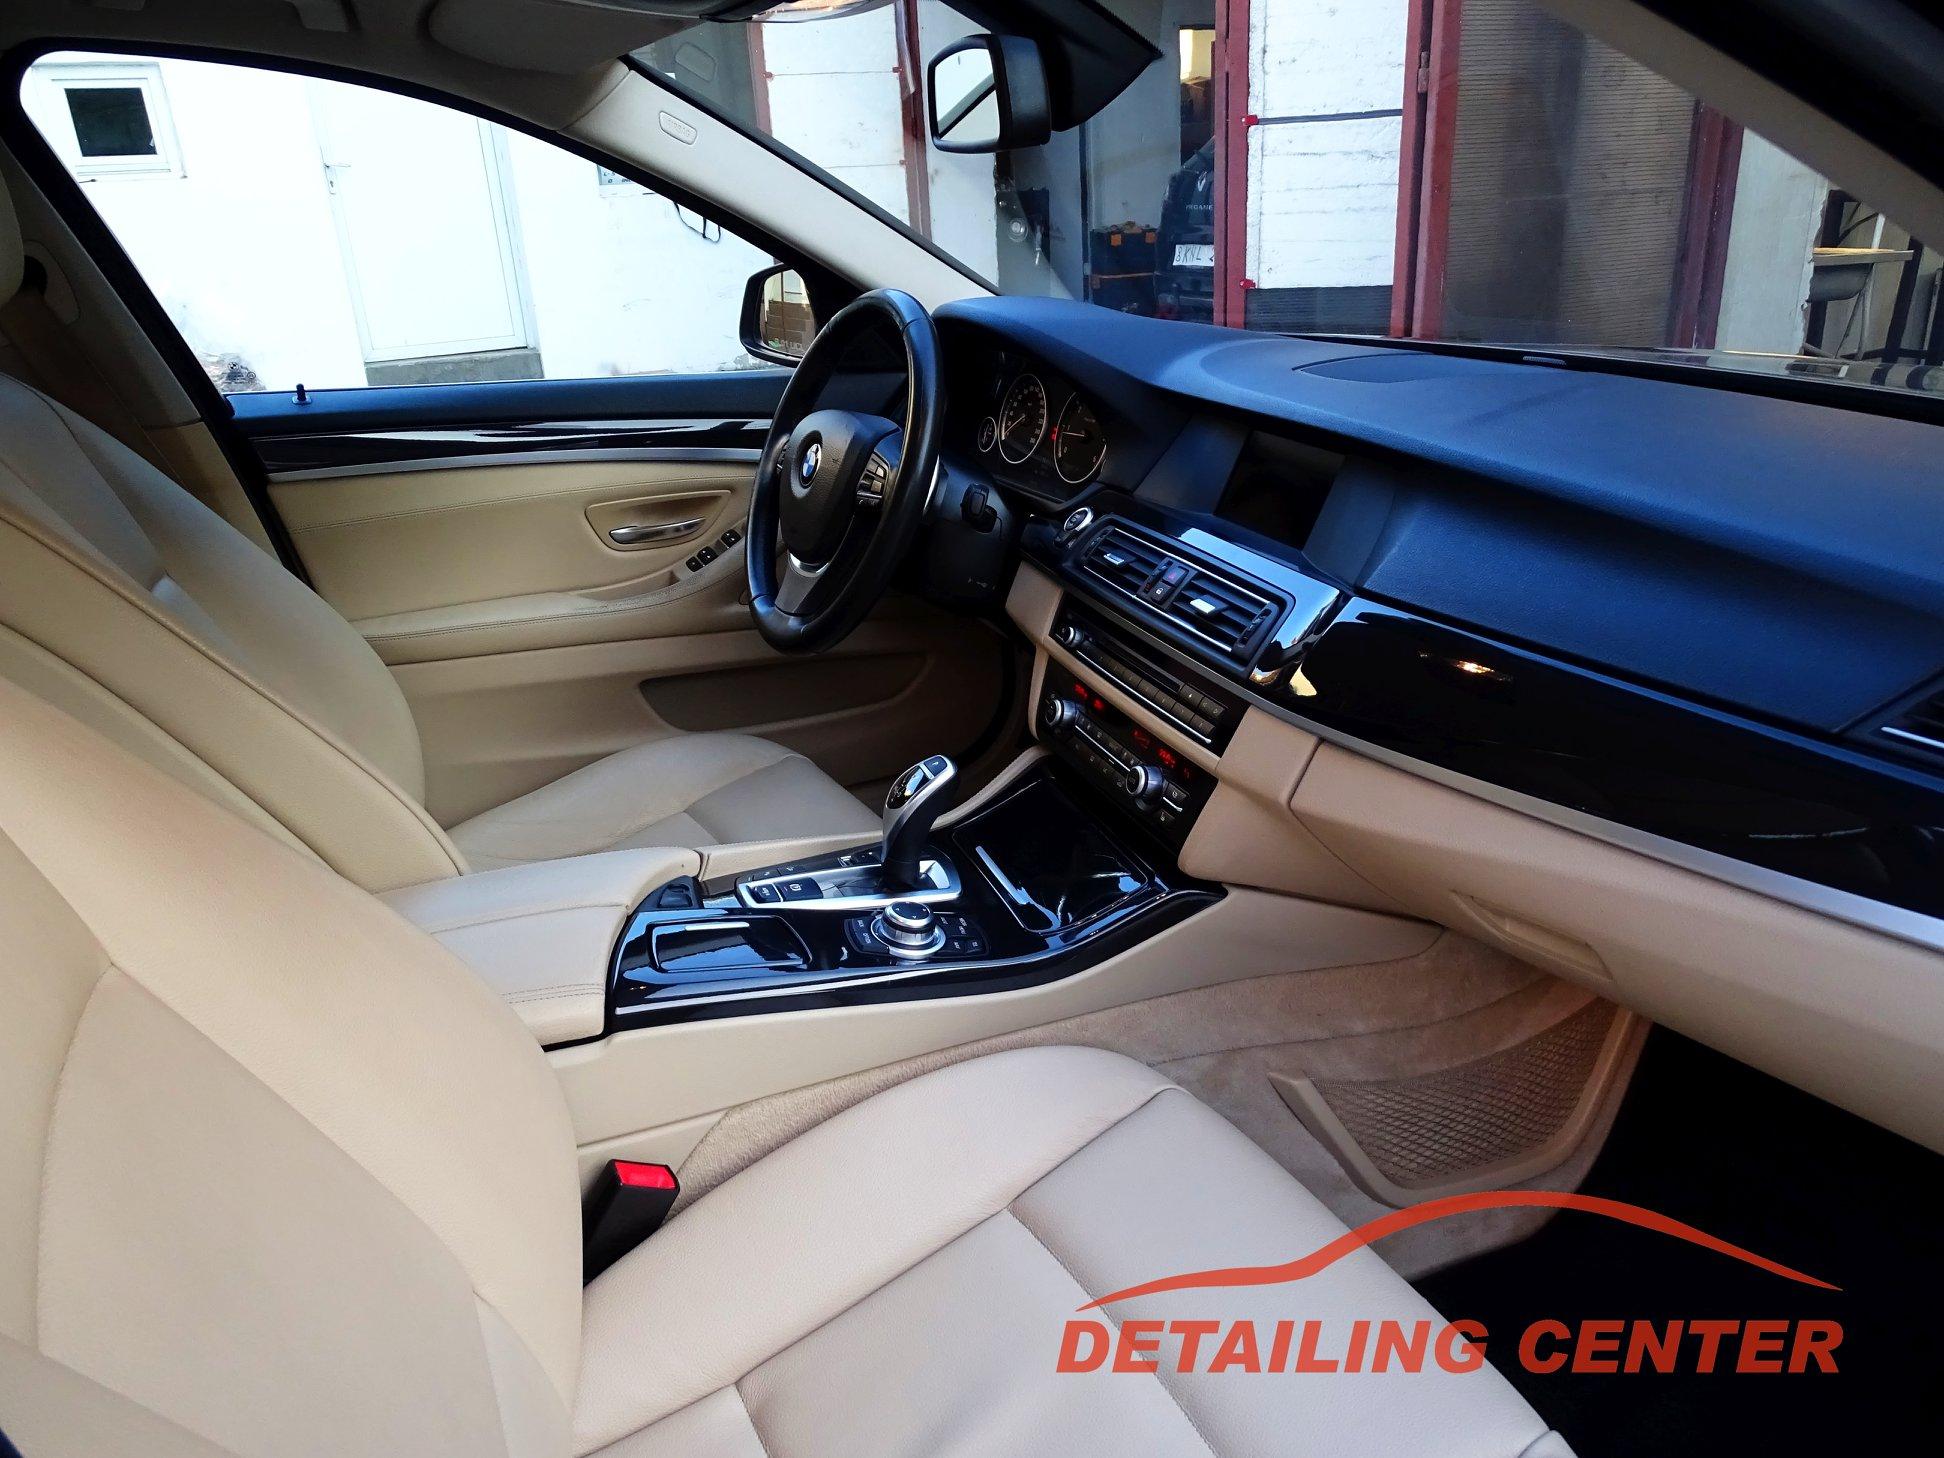 BMW F10 – Detailing Interior